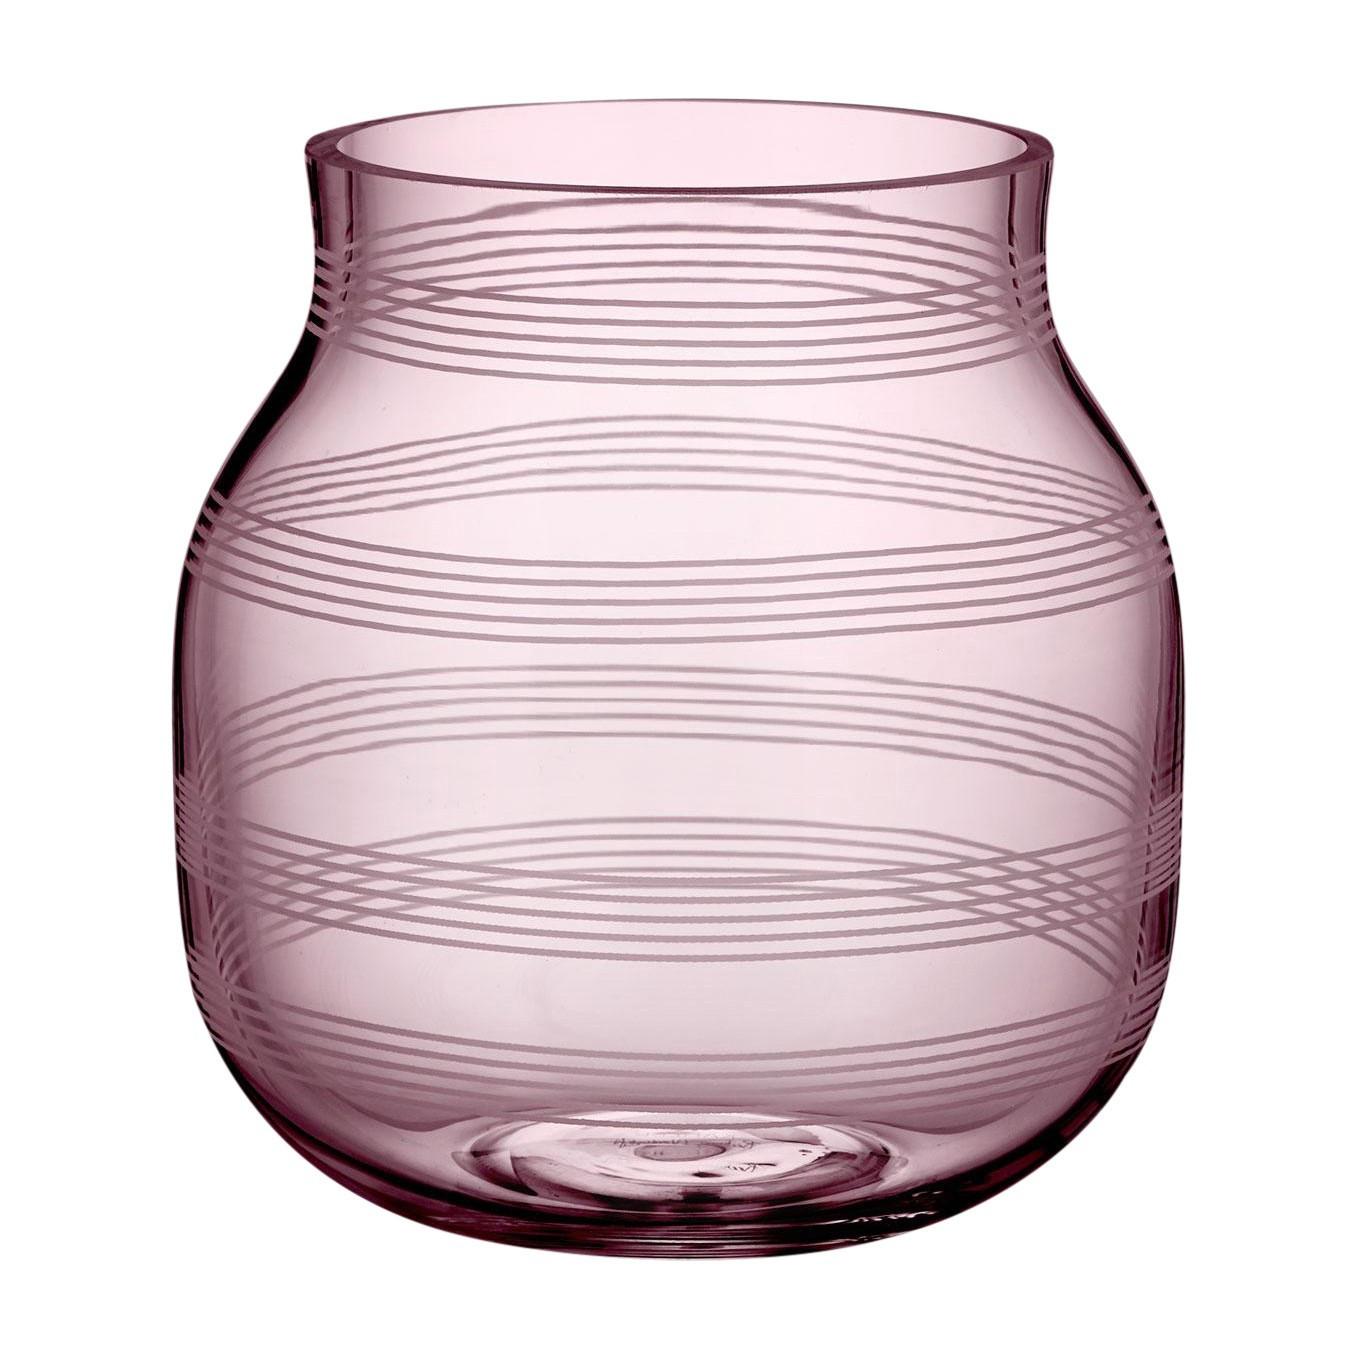 Glass Display Vase Of Ka¤hler Omaggio Glass Vase H 17cm Ambientedirect Throughout Kaehler Omaggio Glasvase H 17cm 1357x1357 Id1922376 Cdd758e4260a859ee9db9bec5014a957